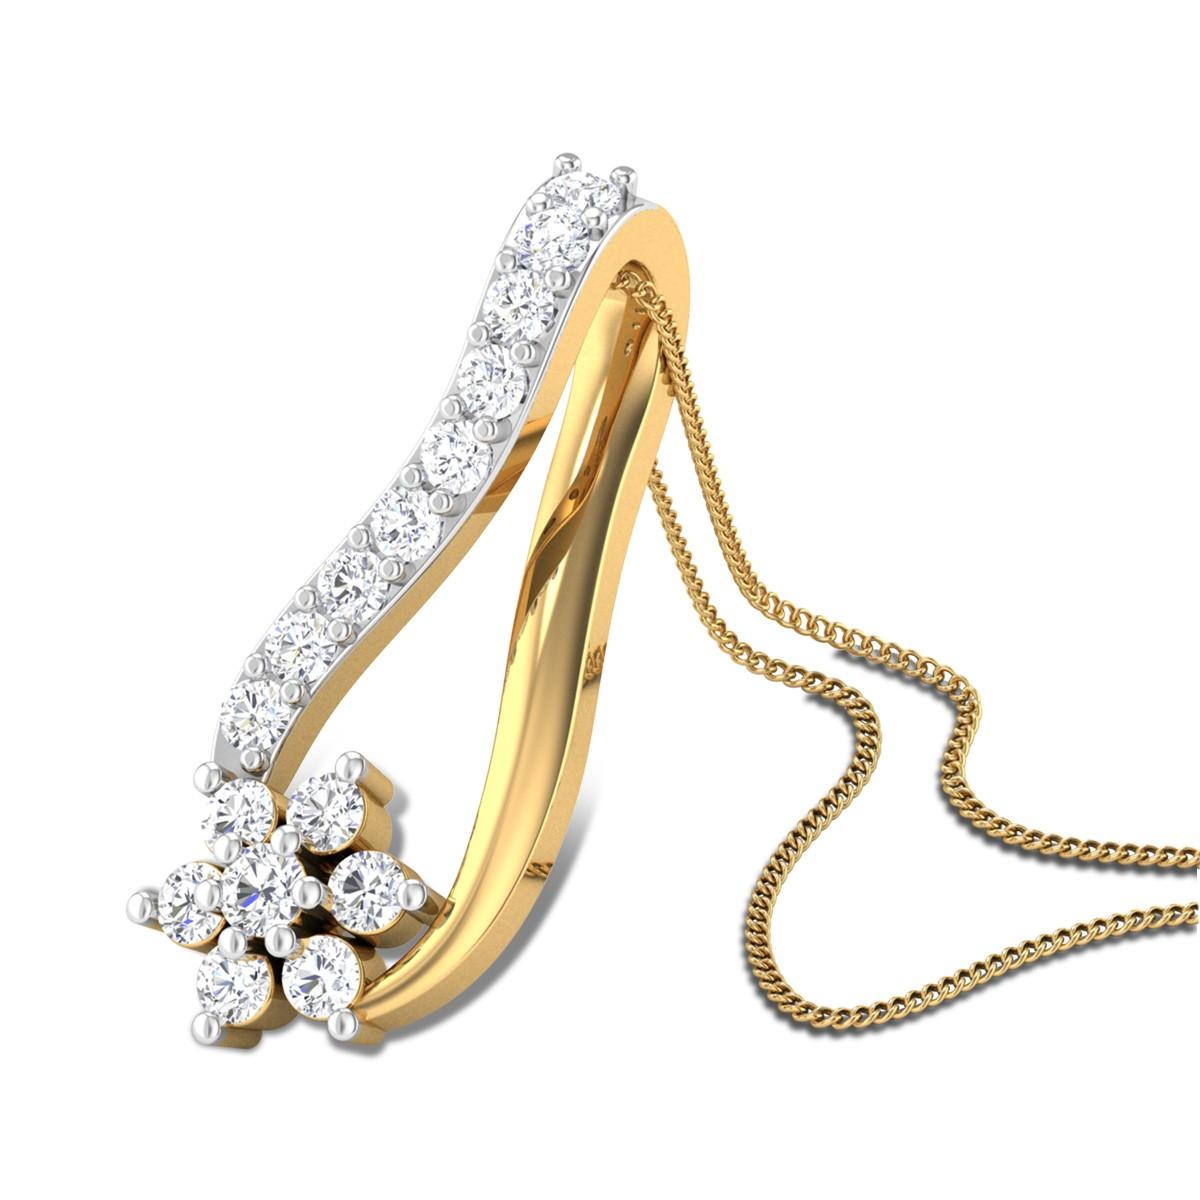 Periwinkle Diamond Pendant